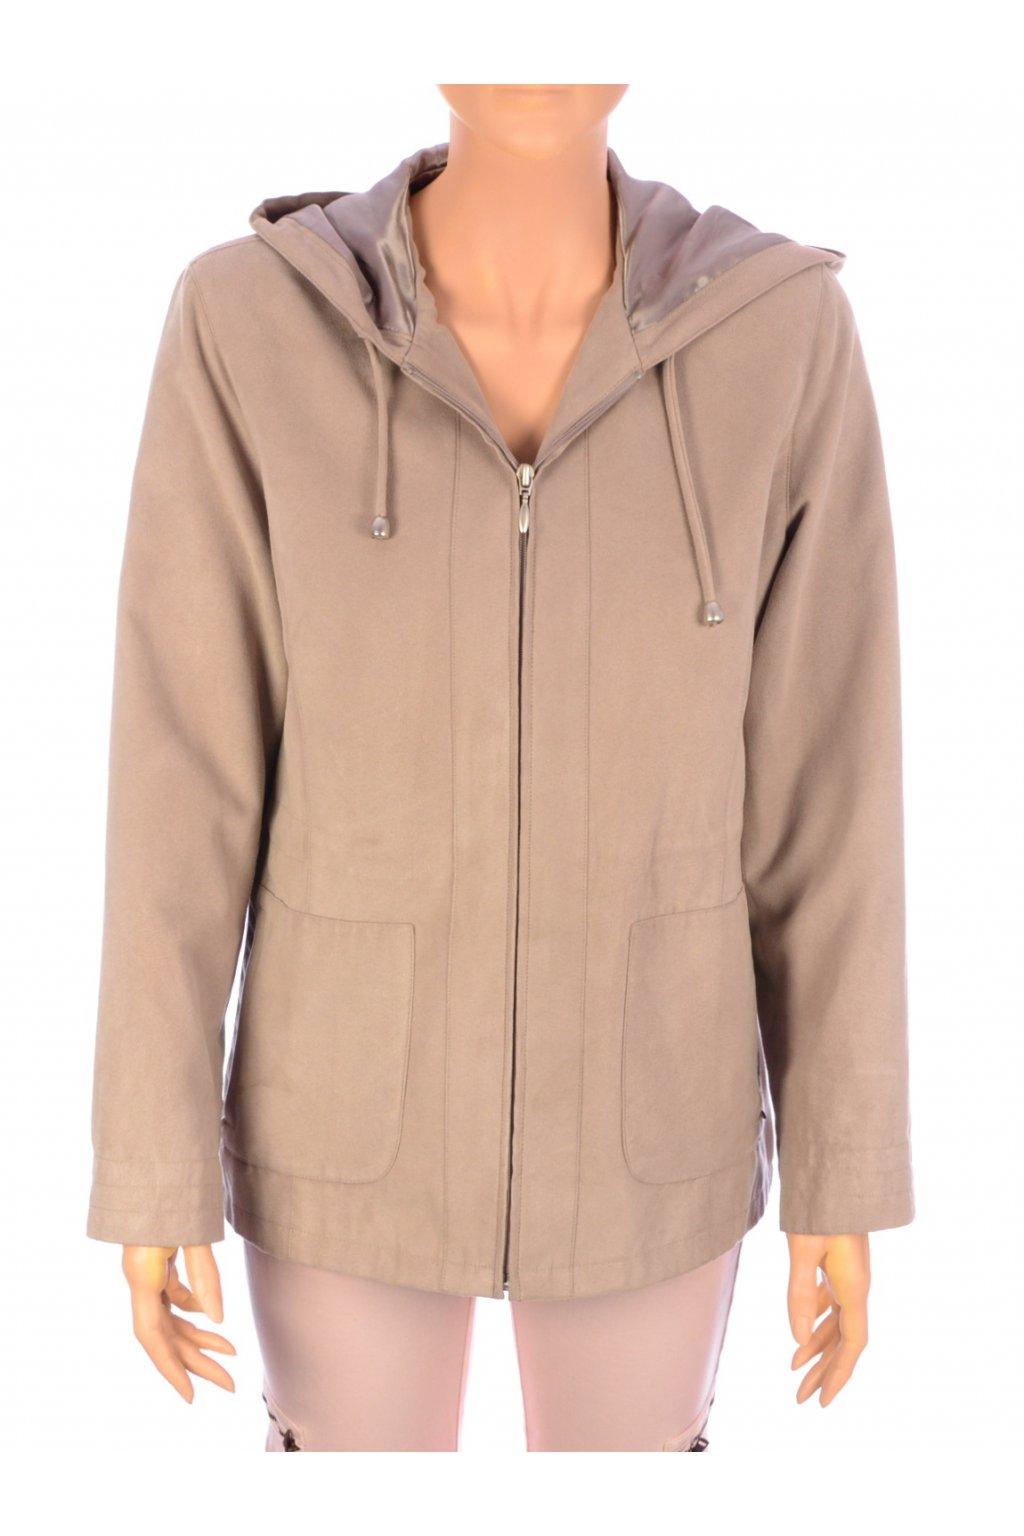 Kabát krátký BHS vel S béžová